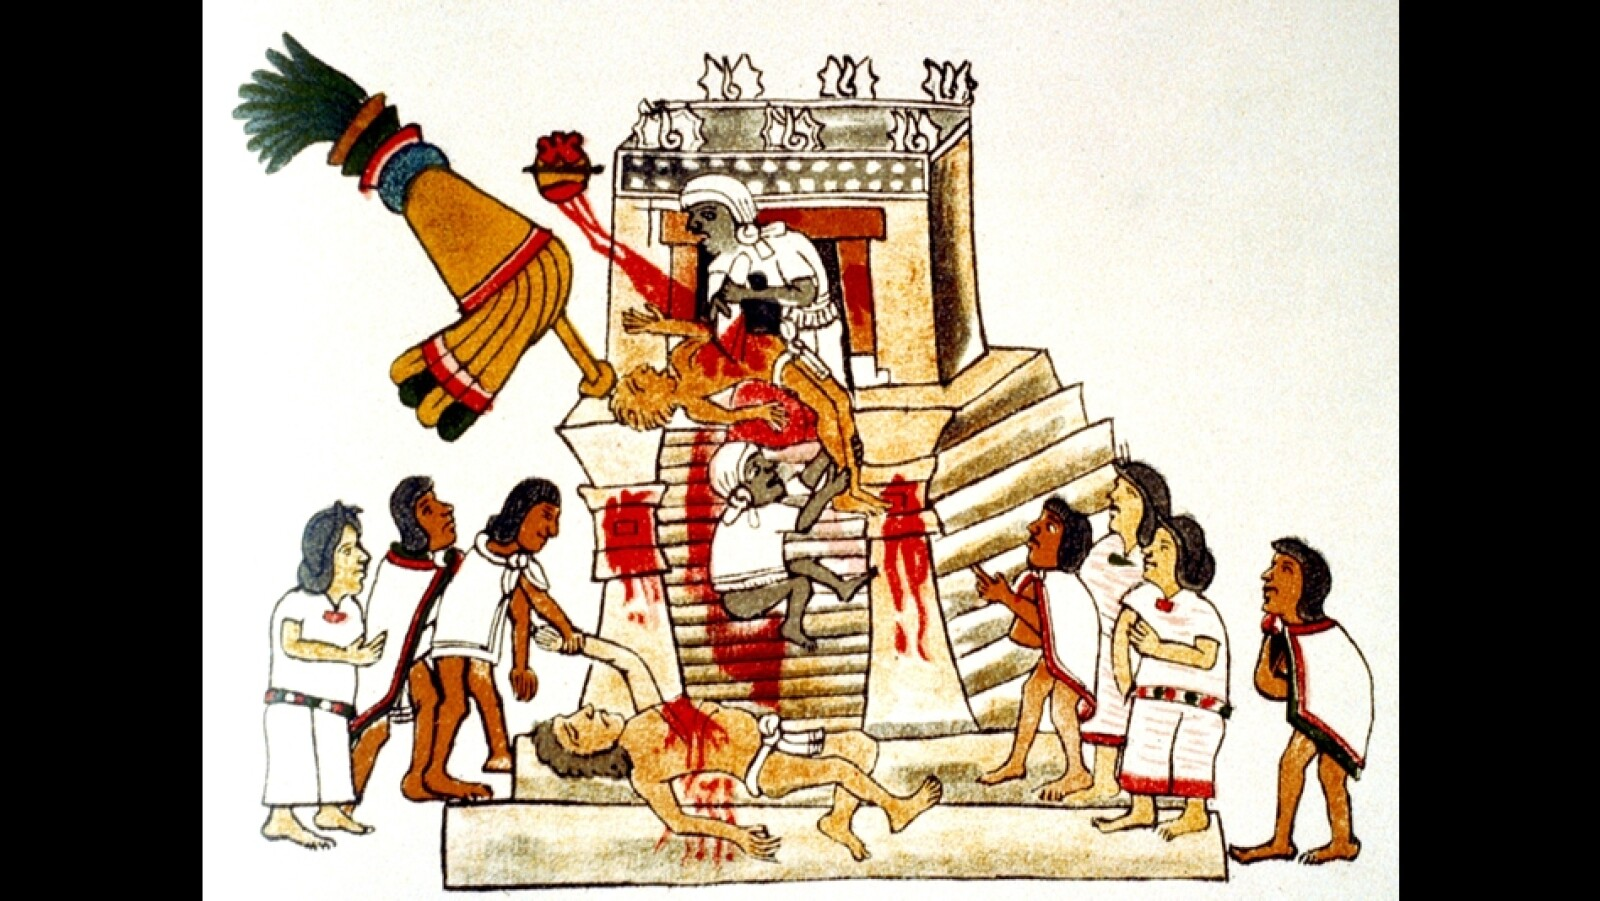 Huitzilopochtli nacimiento 4